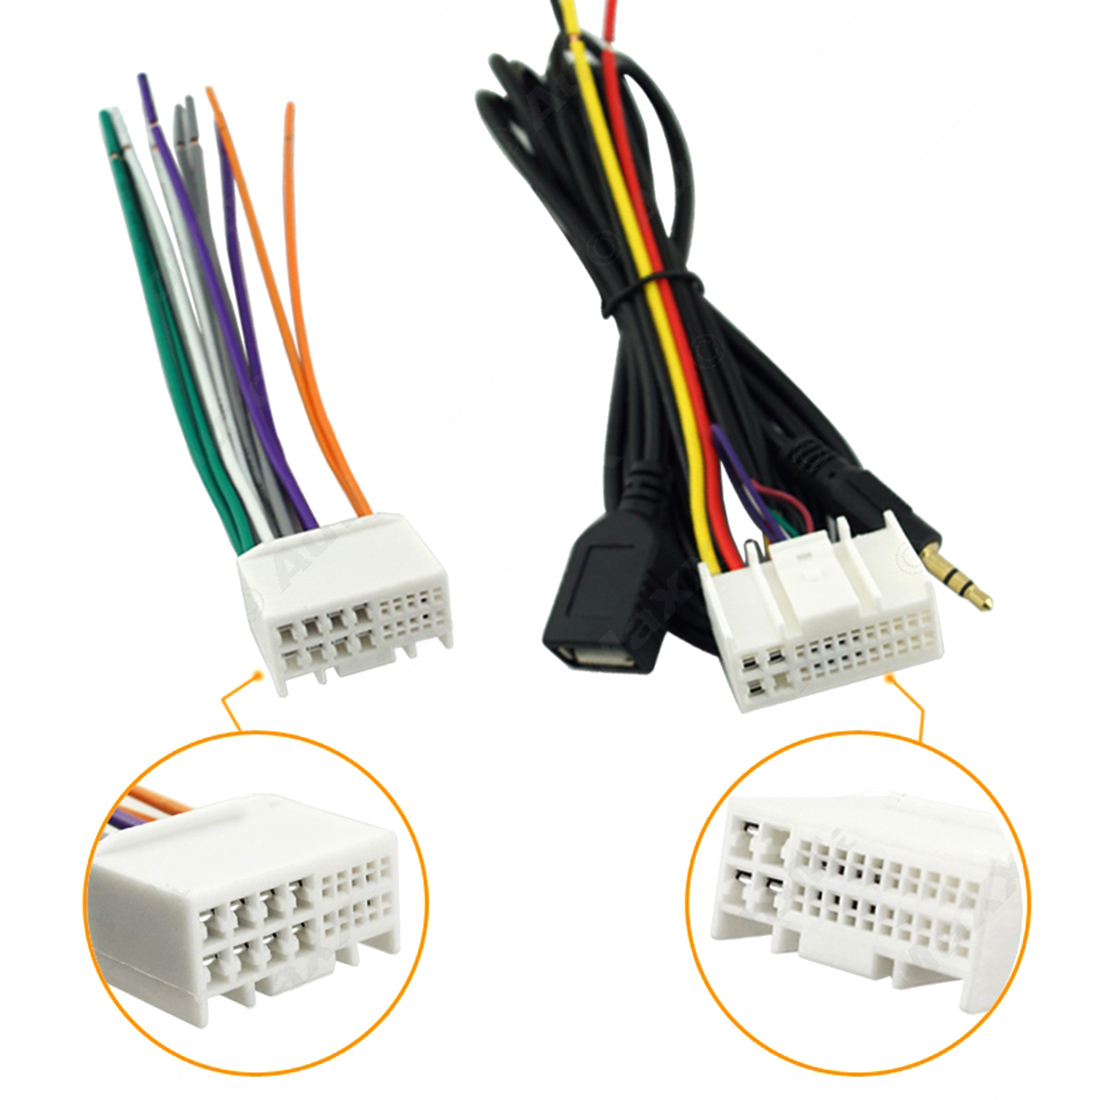 Marsnaska 2016 Car Audio CD Stereo Wiring Harness Adapter With USB/AUX Plug  For Kia